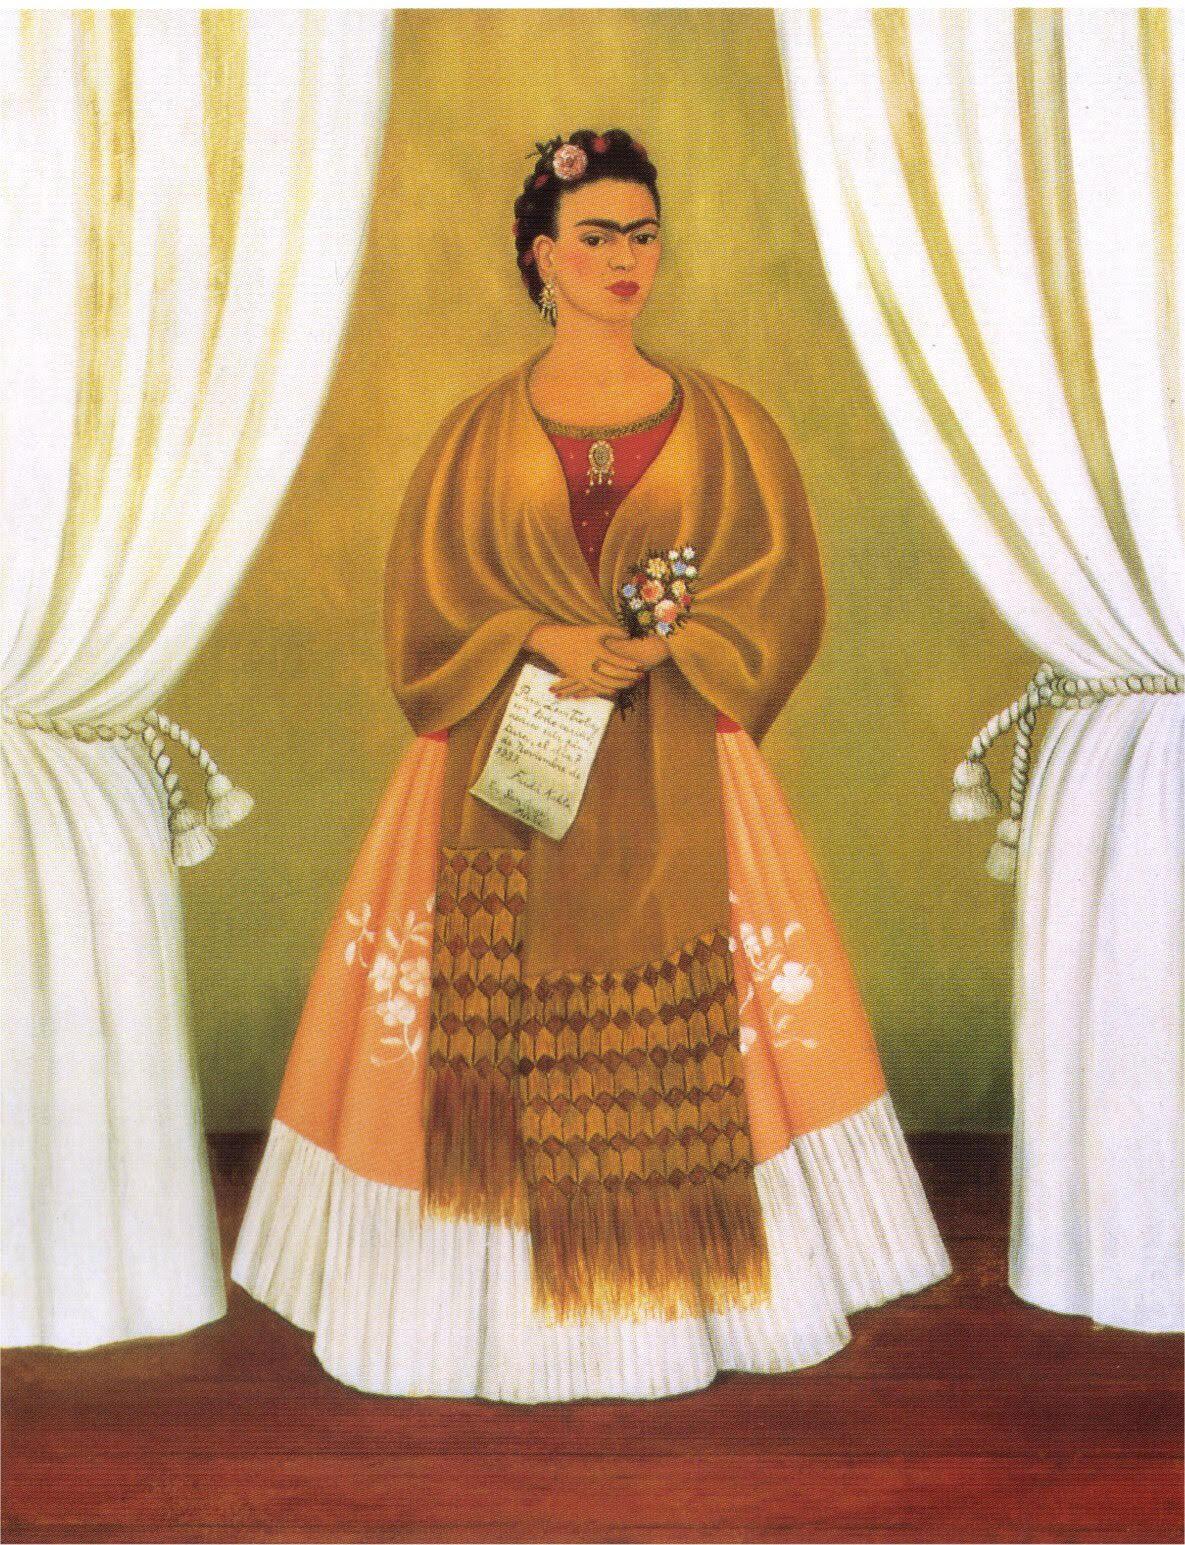 Self portrait dedicated to Leon Trotsky - Frida Kahlo